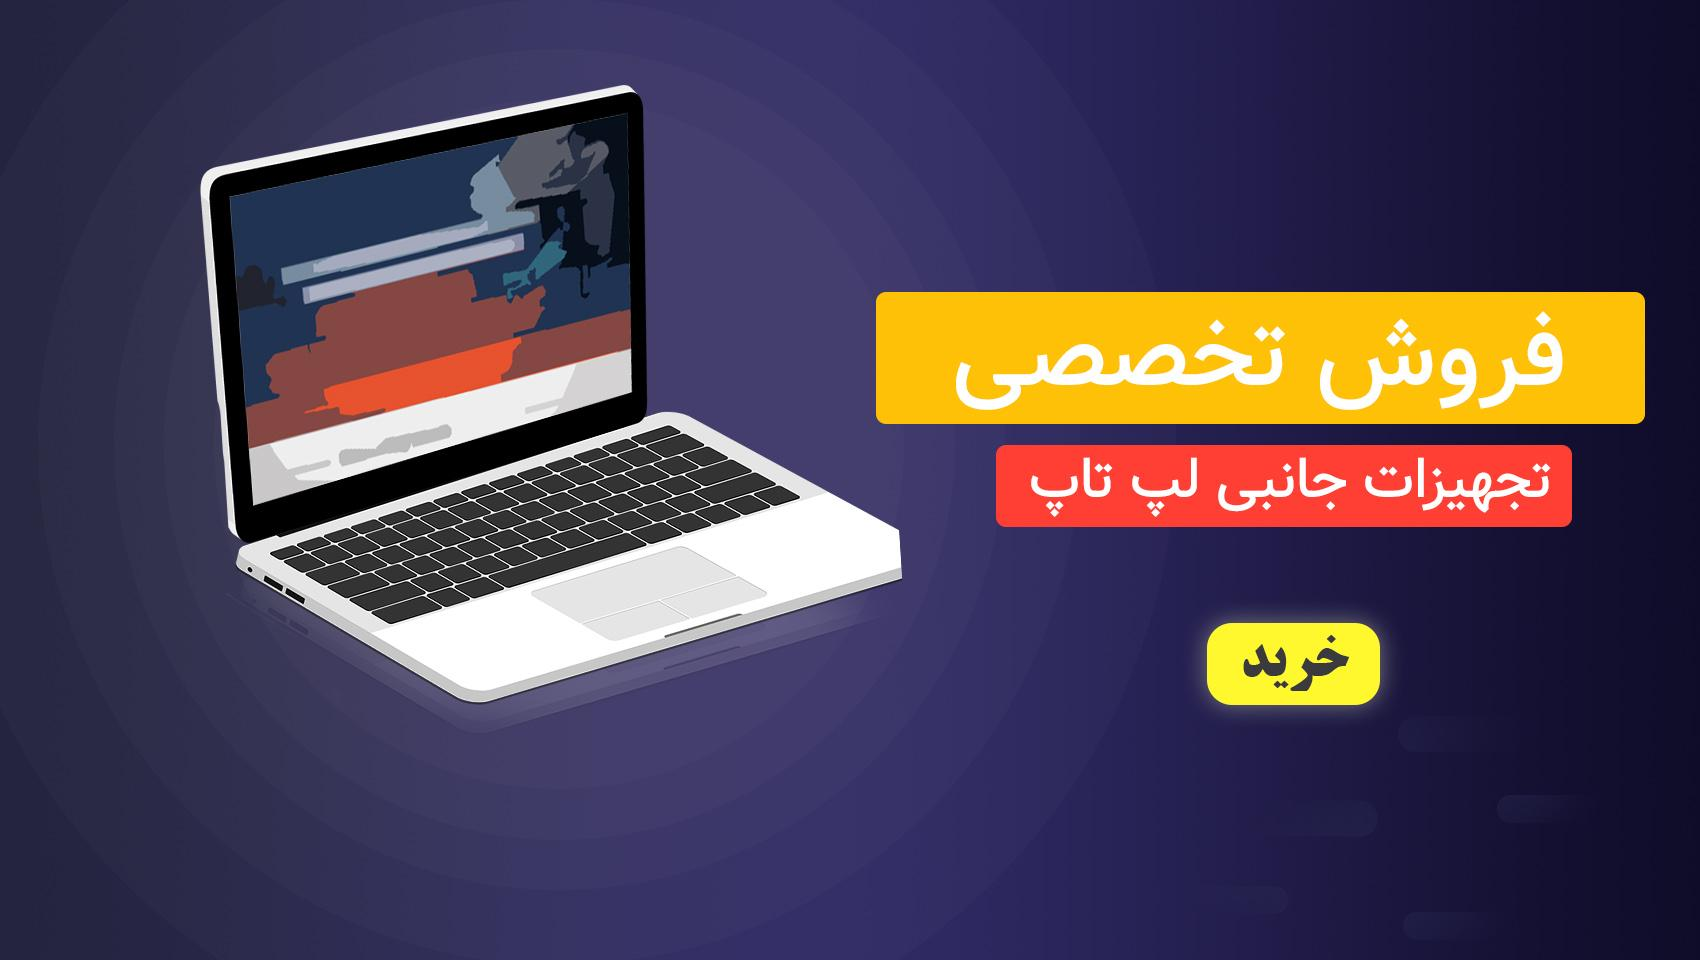 behiranpc laptop accessories - لوازم جانبی لپتاپ